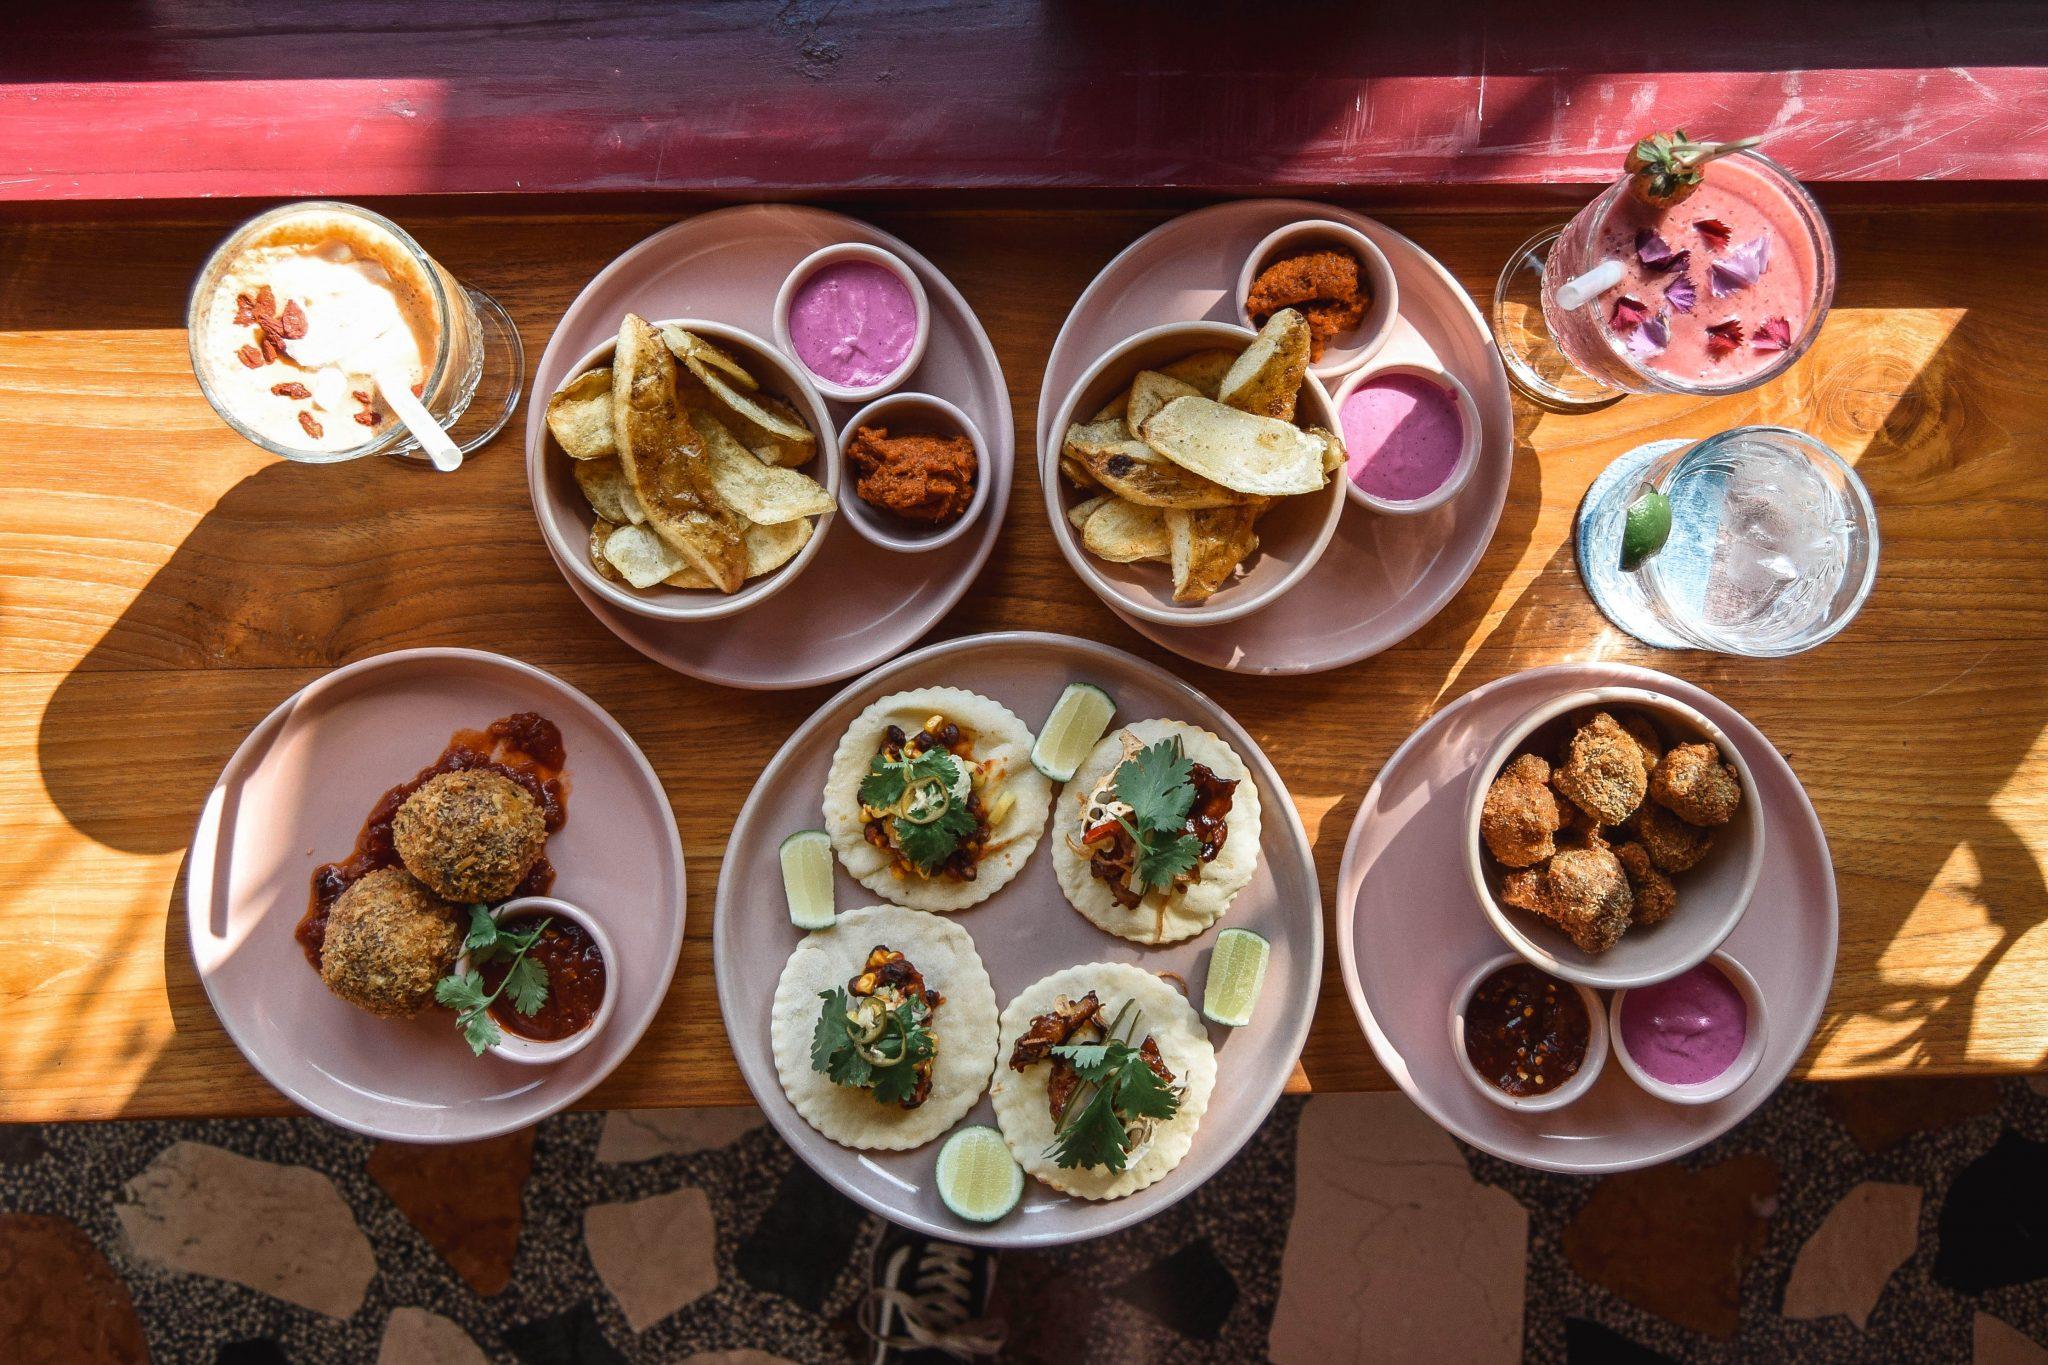 Wanderers & Warriors - Neon Palms Bali - Best Restaurants In Bali Restaurants - Best Restaurants In Seminyak